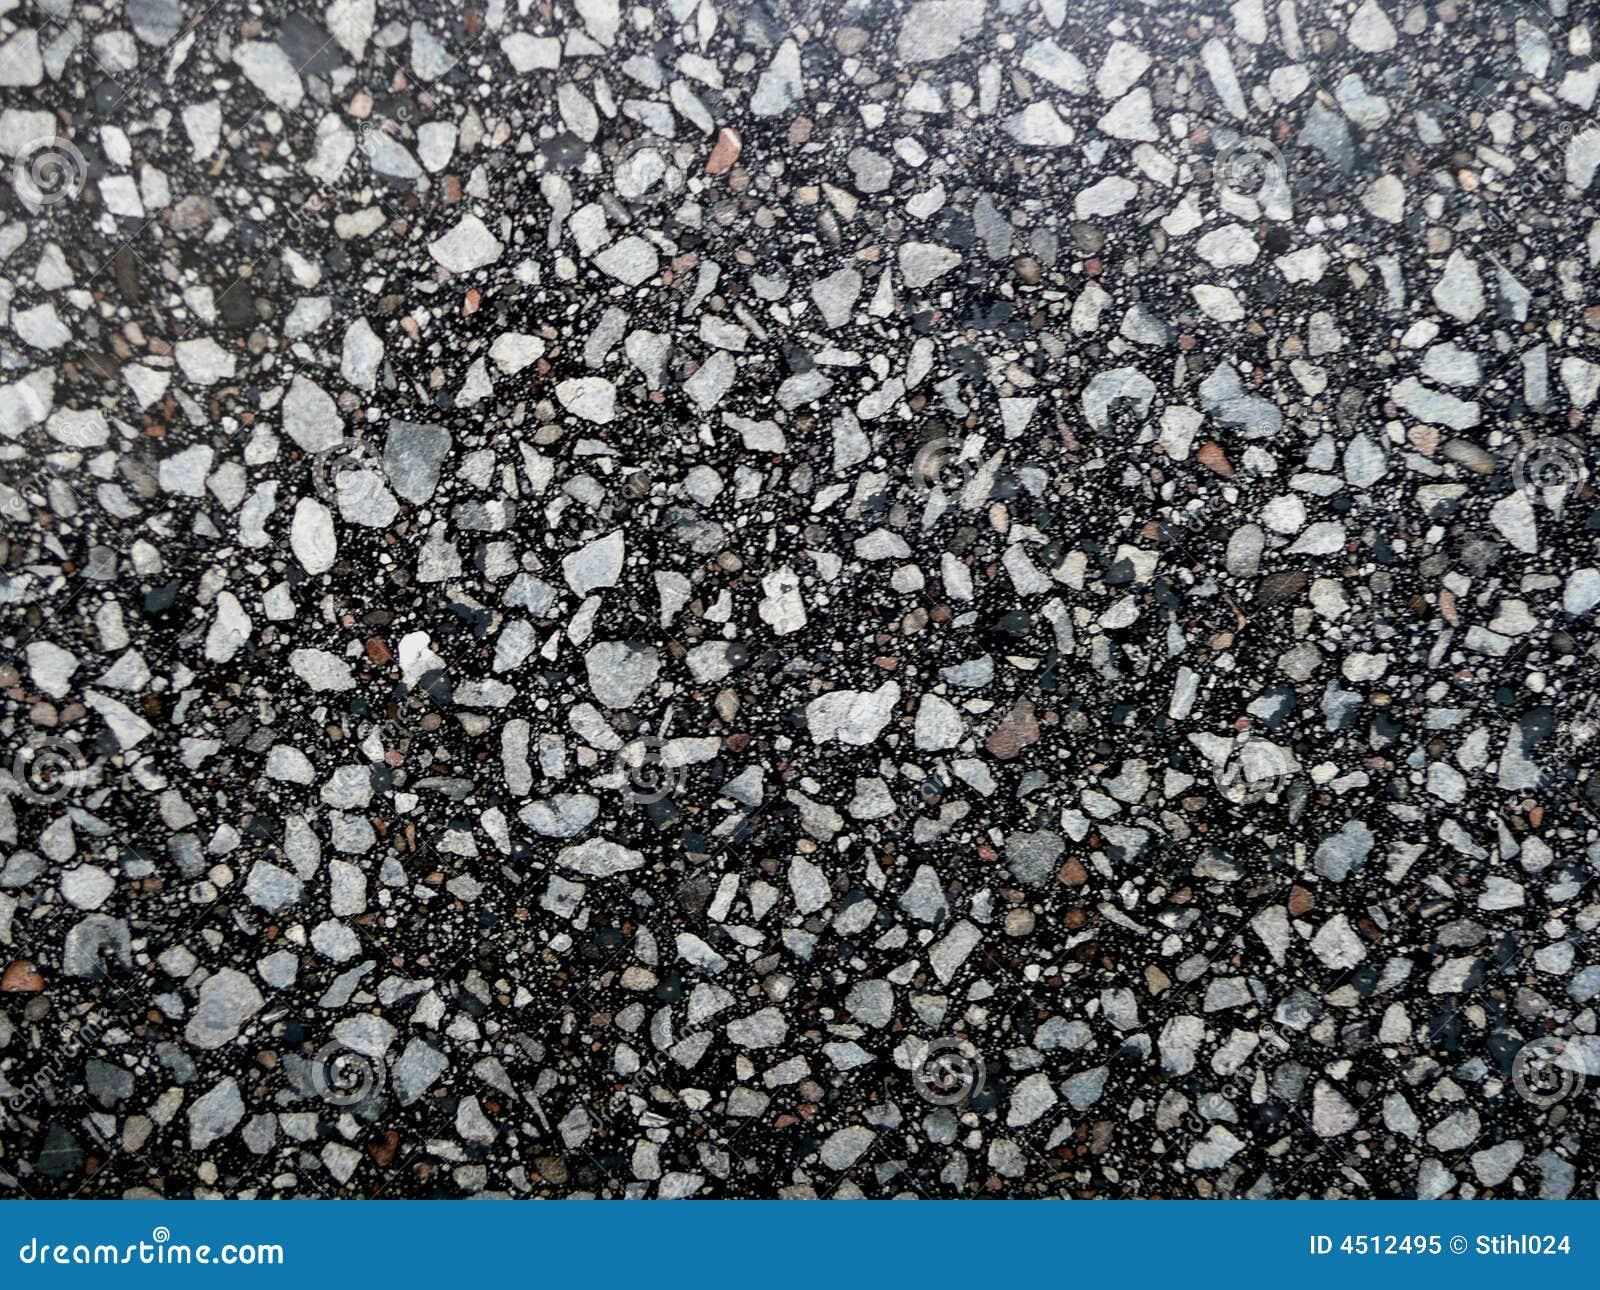 Fußbodenbelag Terrazzo ~ Terrazzobodenbelag stockbild bild von nervös boden blurry